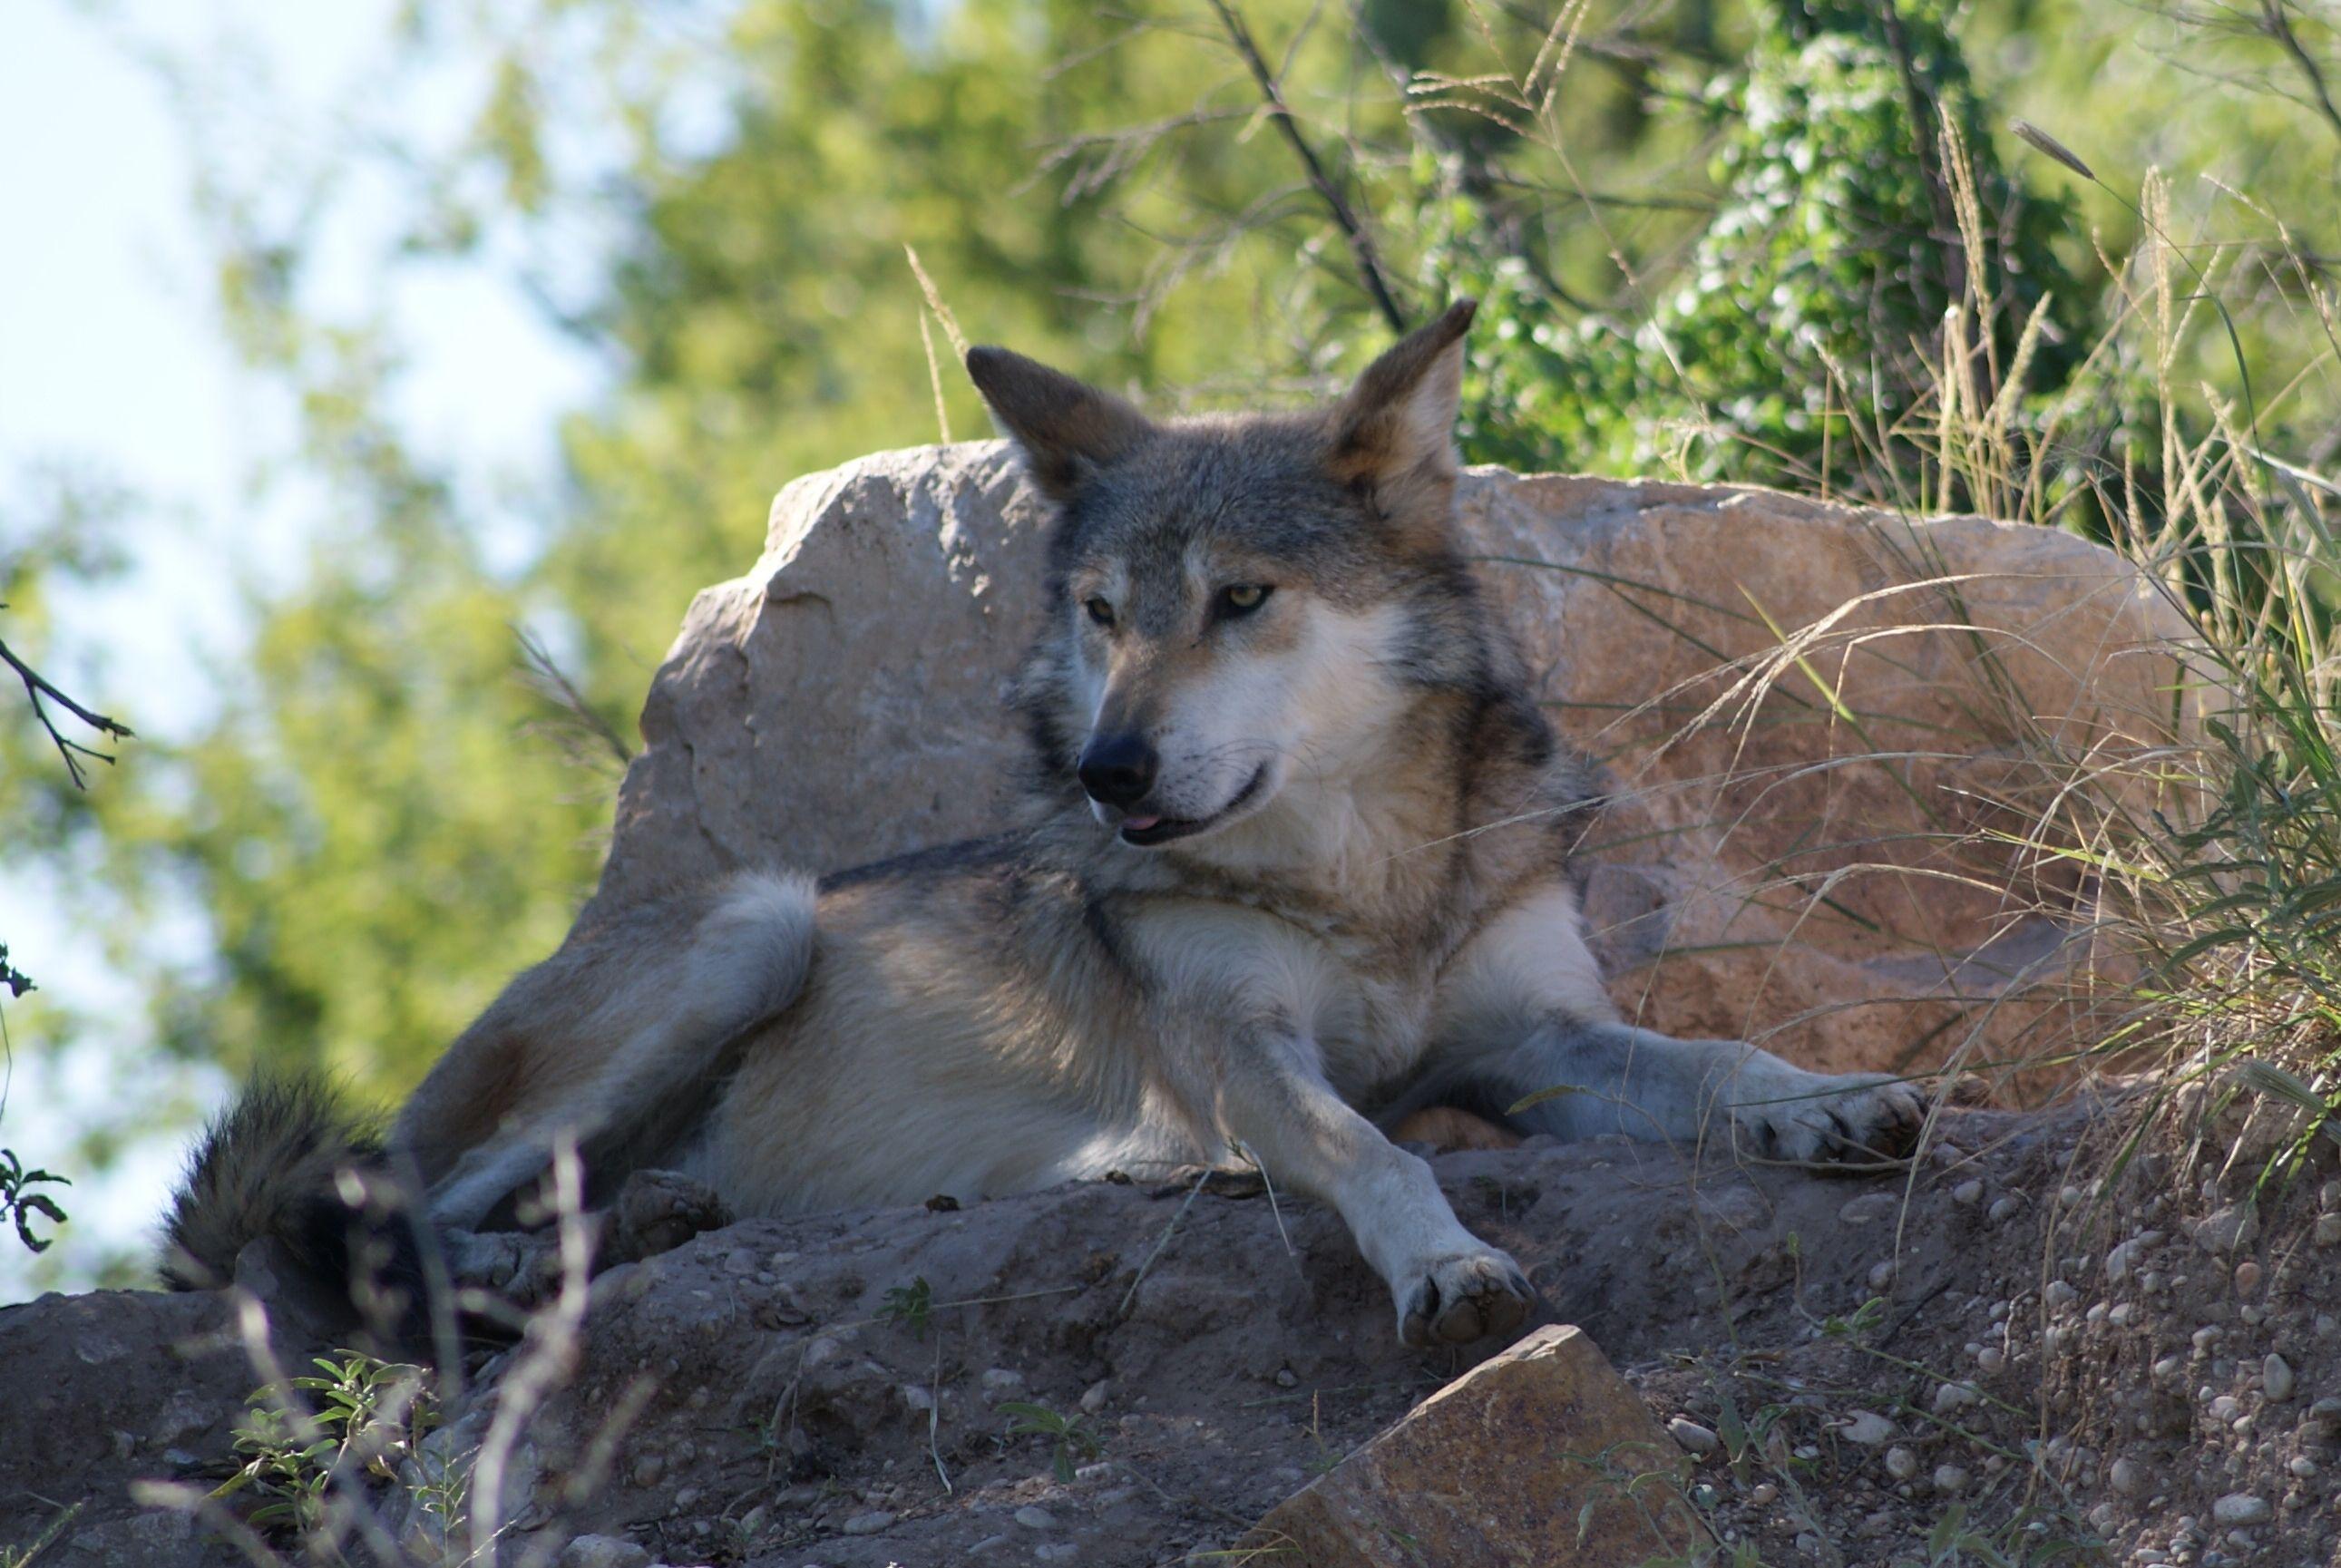 b711e615e92aacd808303e5a1b366388 - Living Desert Zoo And Gardens State Park New Mexico